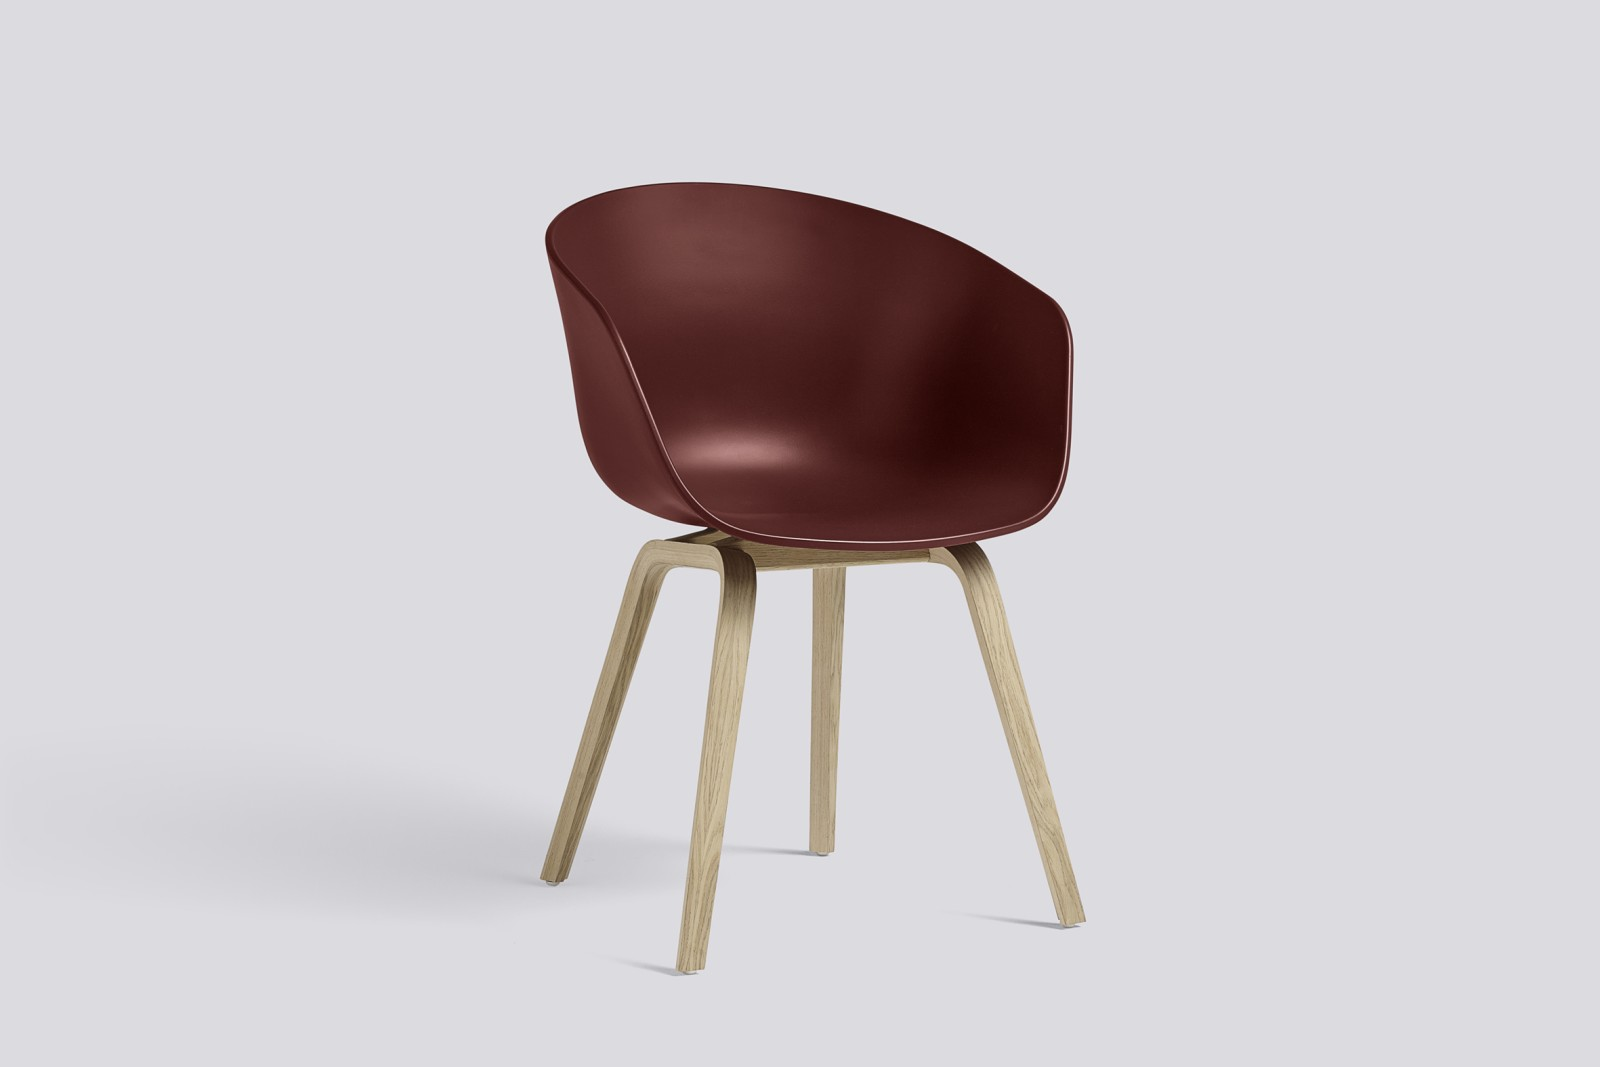 About A Chair AAC22 Brick Seat, Matt Lacquered Oak Base